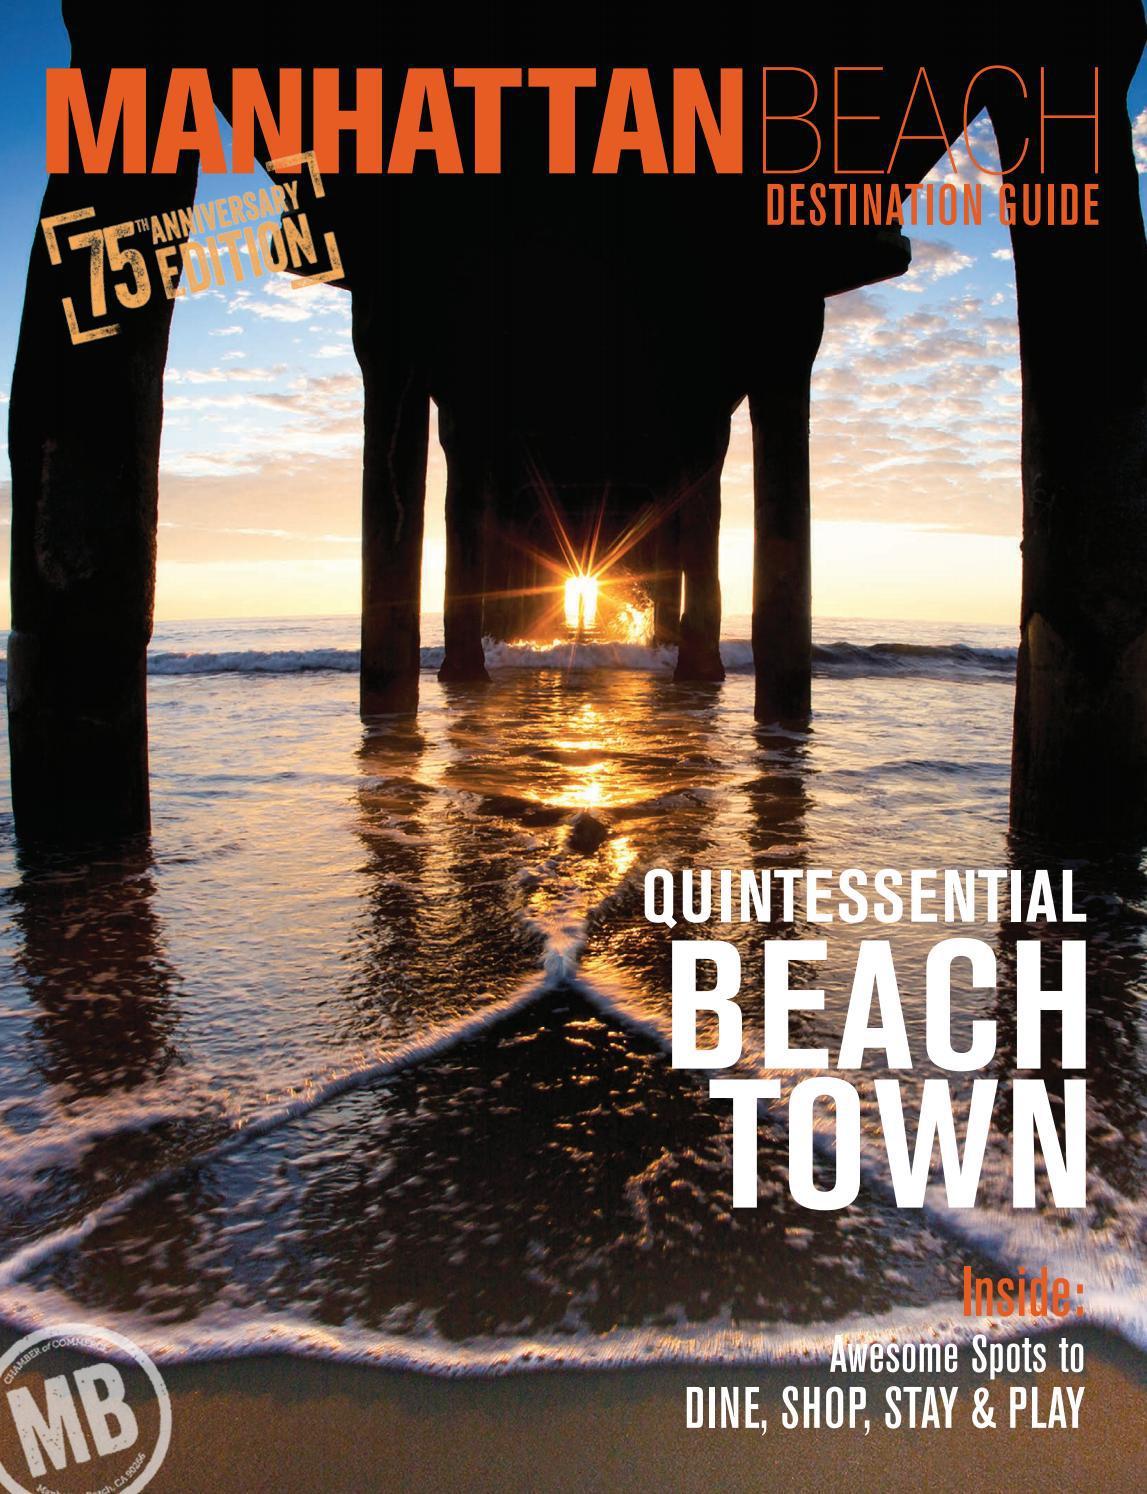 Manhattan Beach 2016 Destination Guide by Atlantic West Publishers